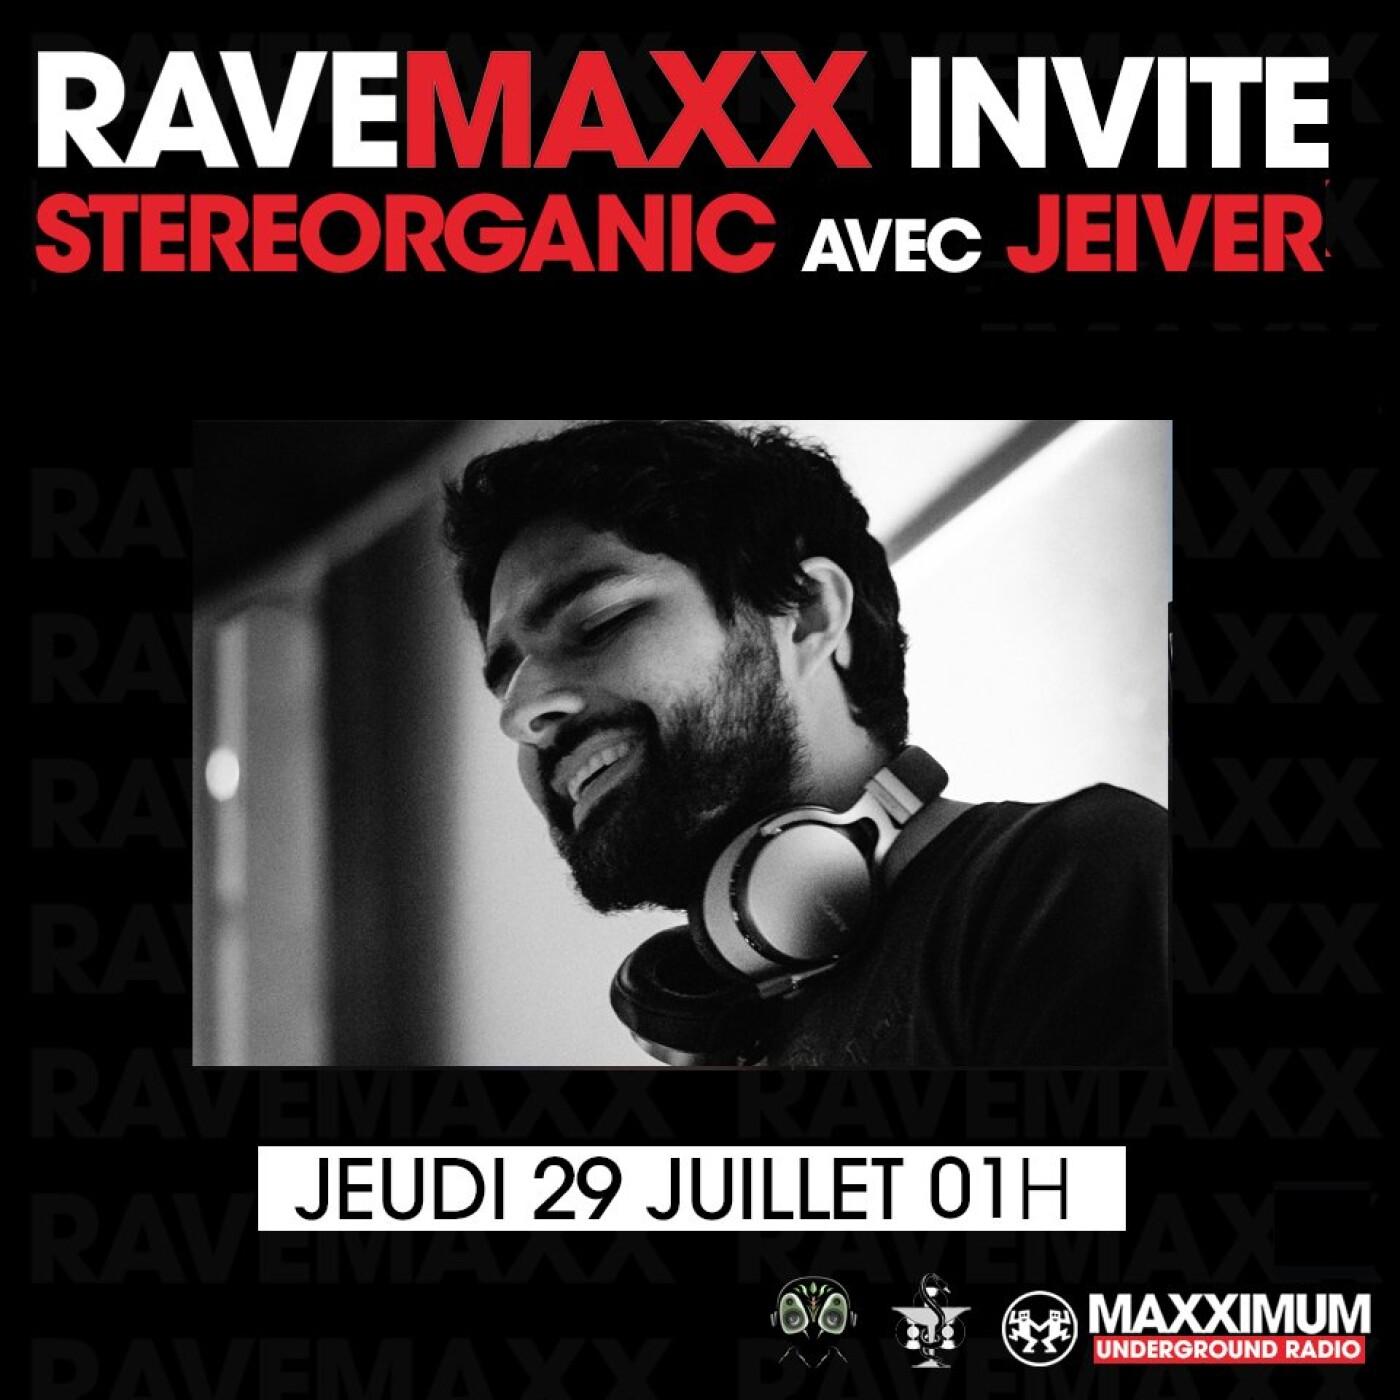 RAVEMAXX : JEIVER